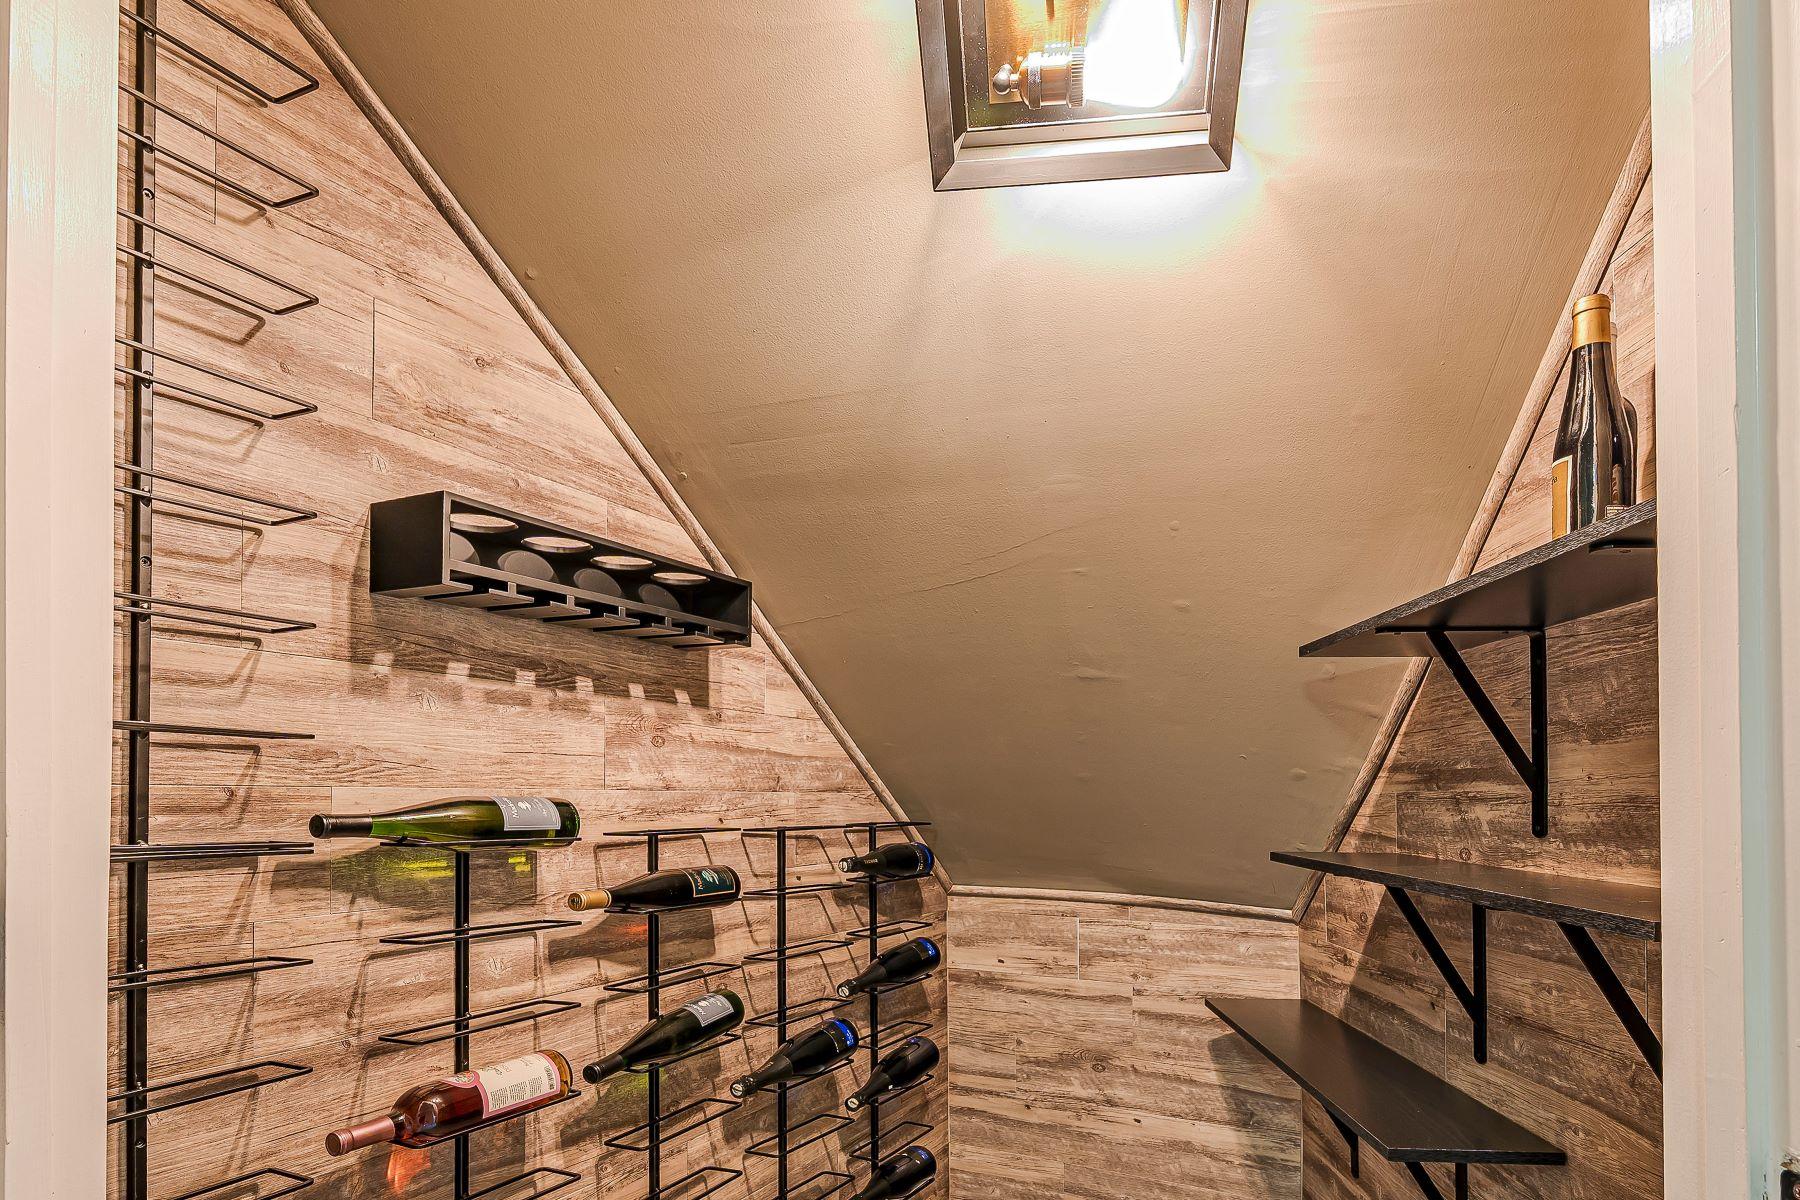 Additional photo for property listing at 1585 Star Way, Reno, NV 89511 1585 Star Way Reno, Nevada 89511 Estados Unidos